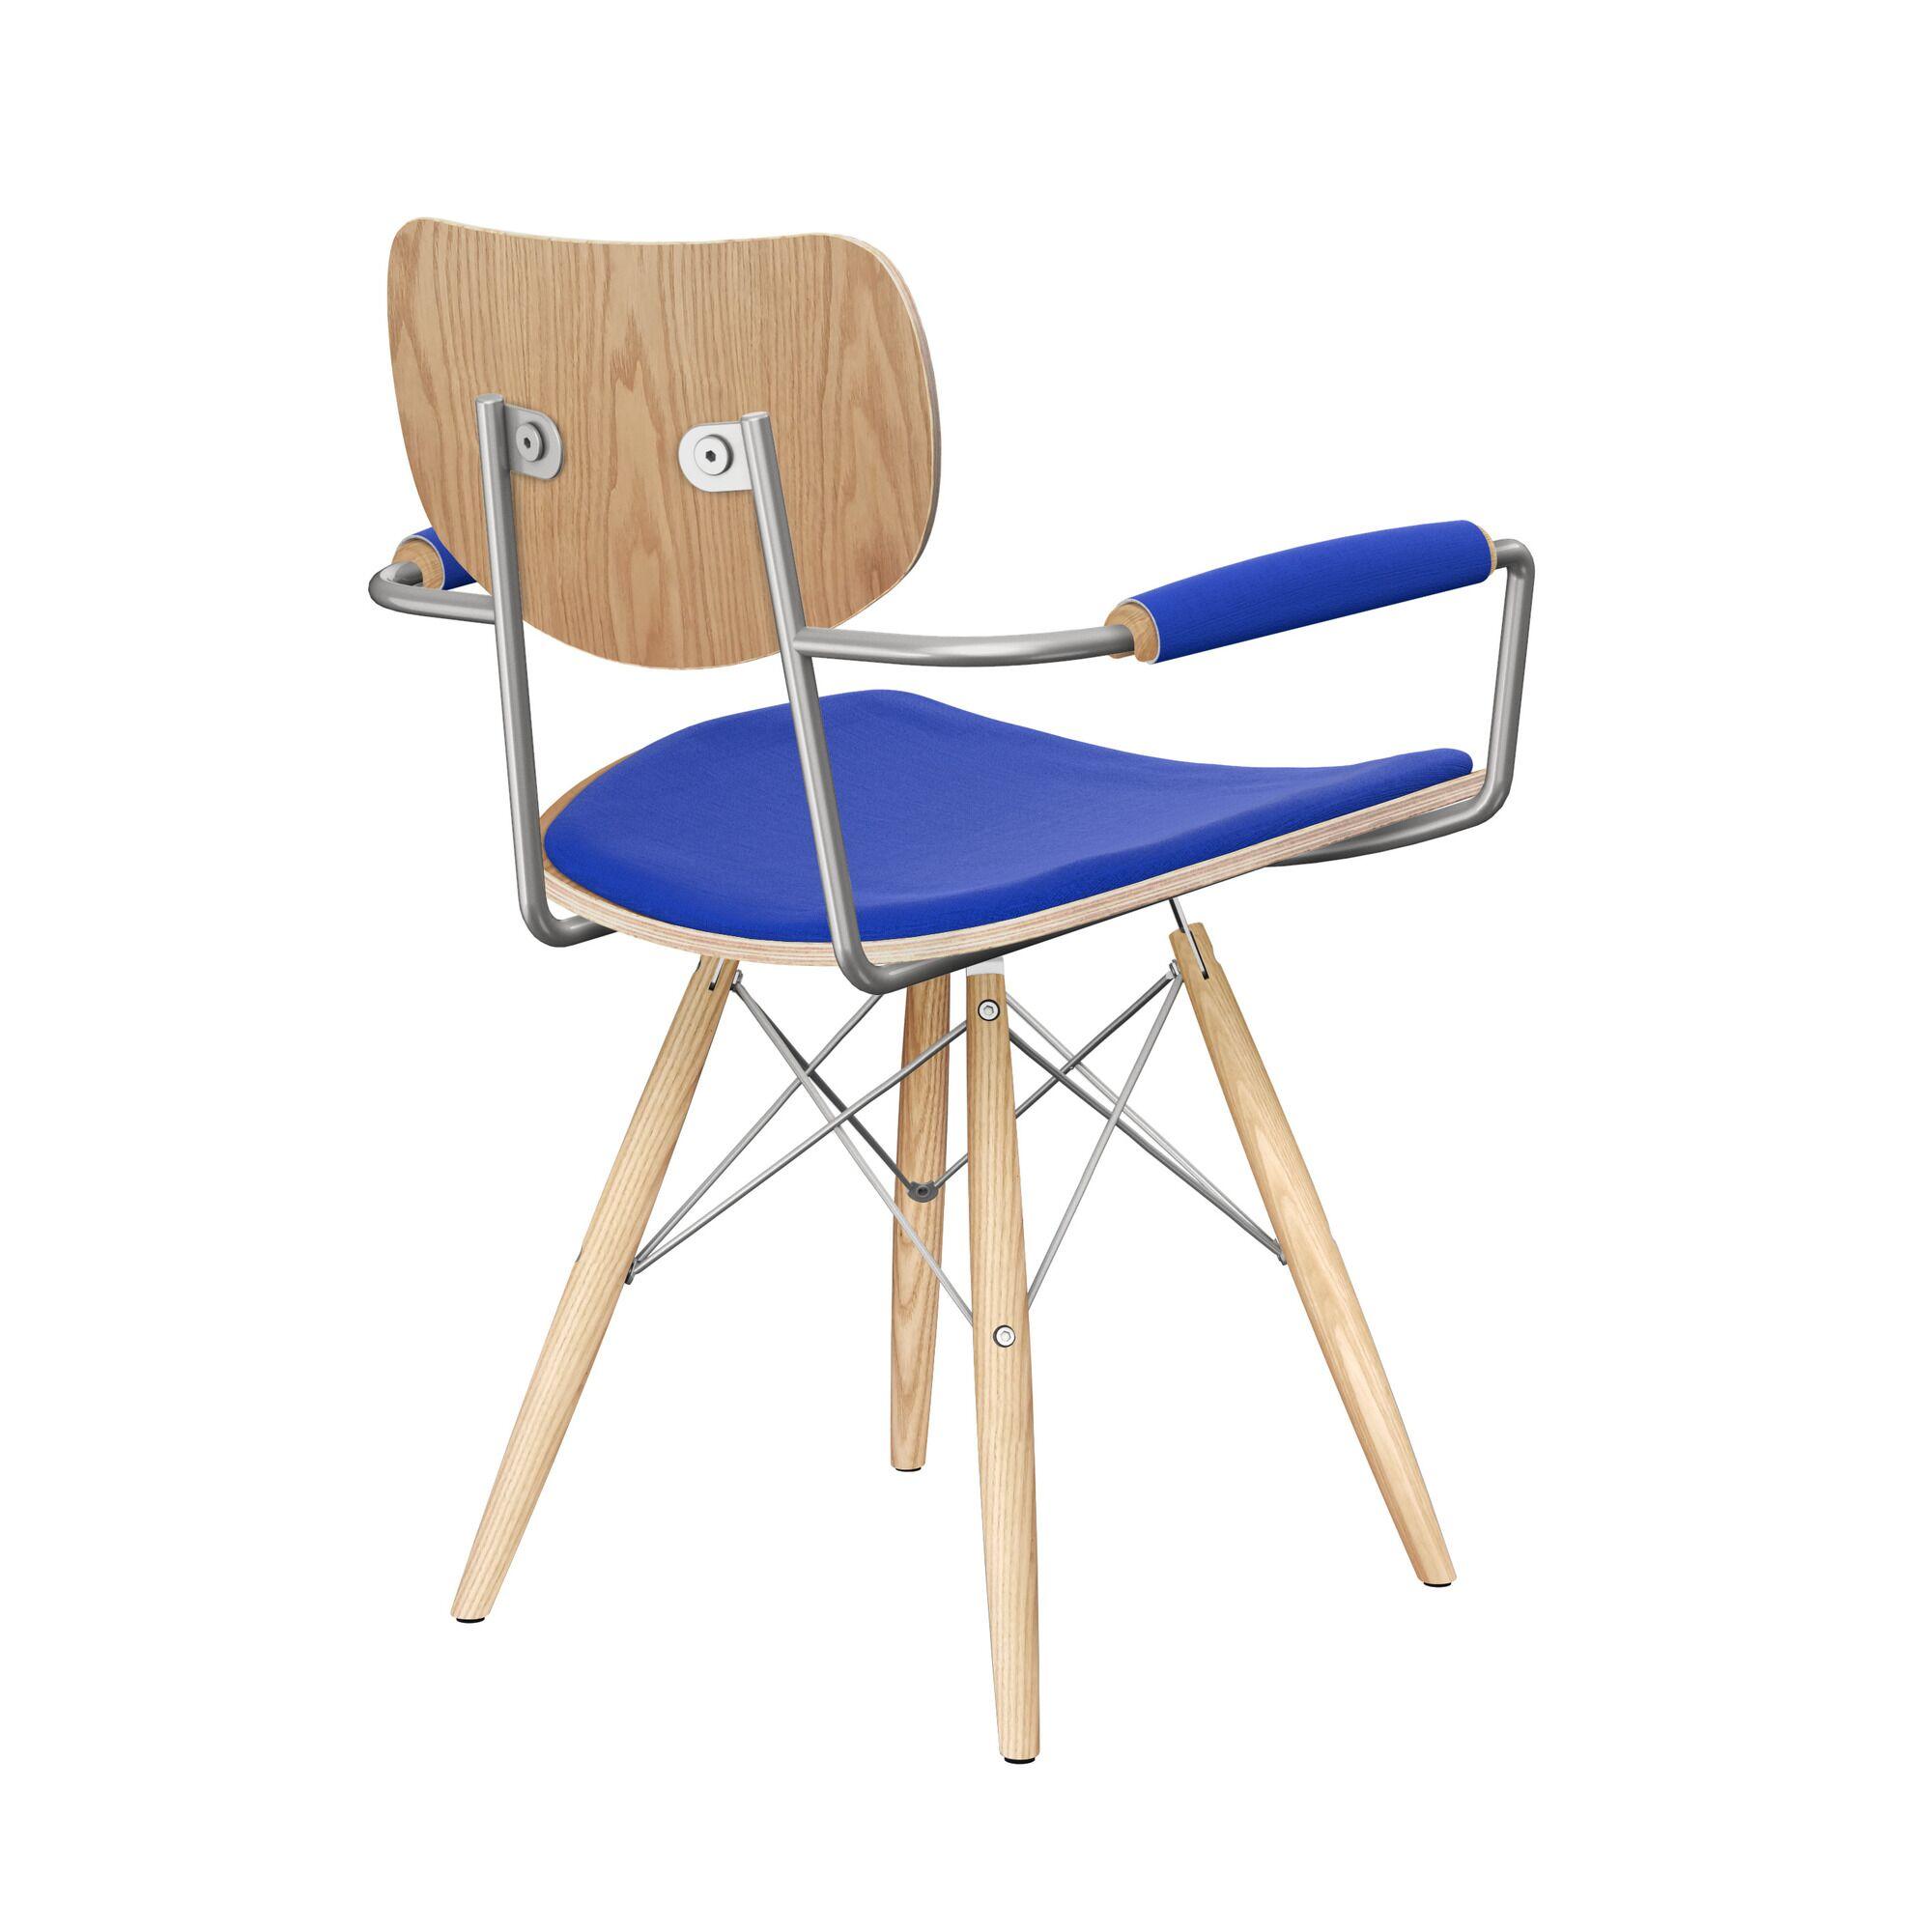 Bastow Upholstered Dining Chair Upholstery Color: Vibrant Dark Blue, Leg Color: Natural, Frame Color: Natural